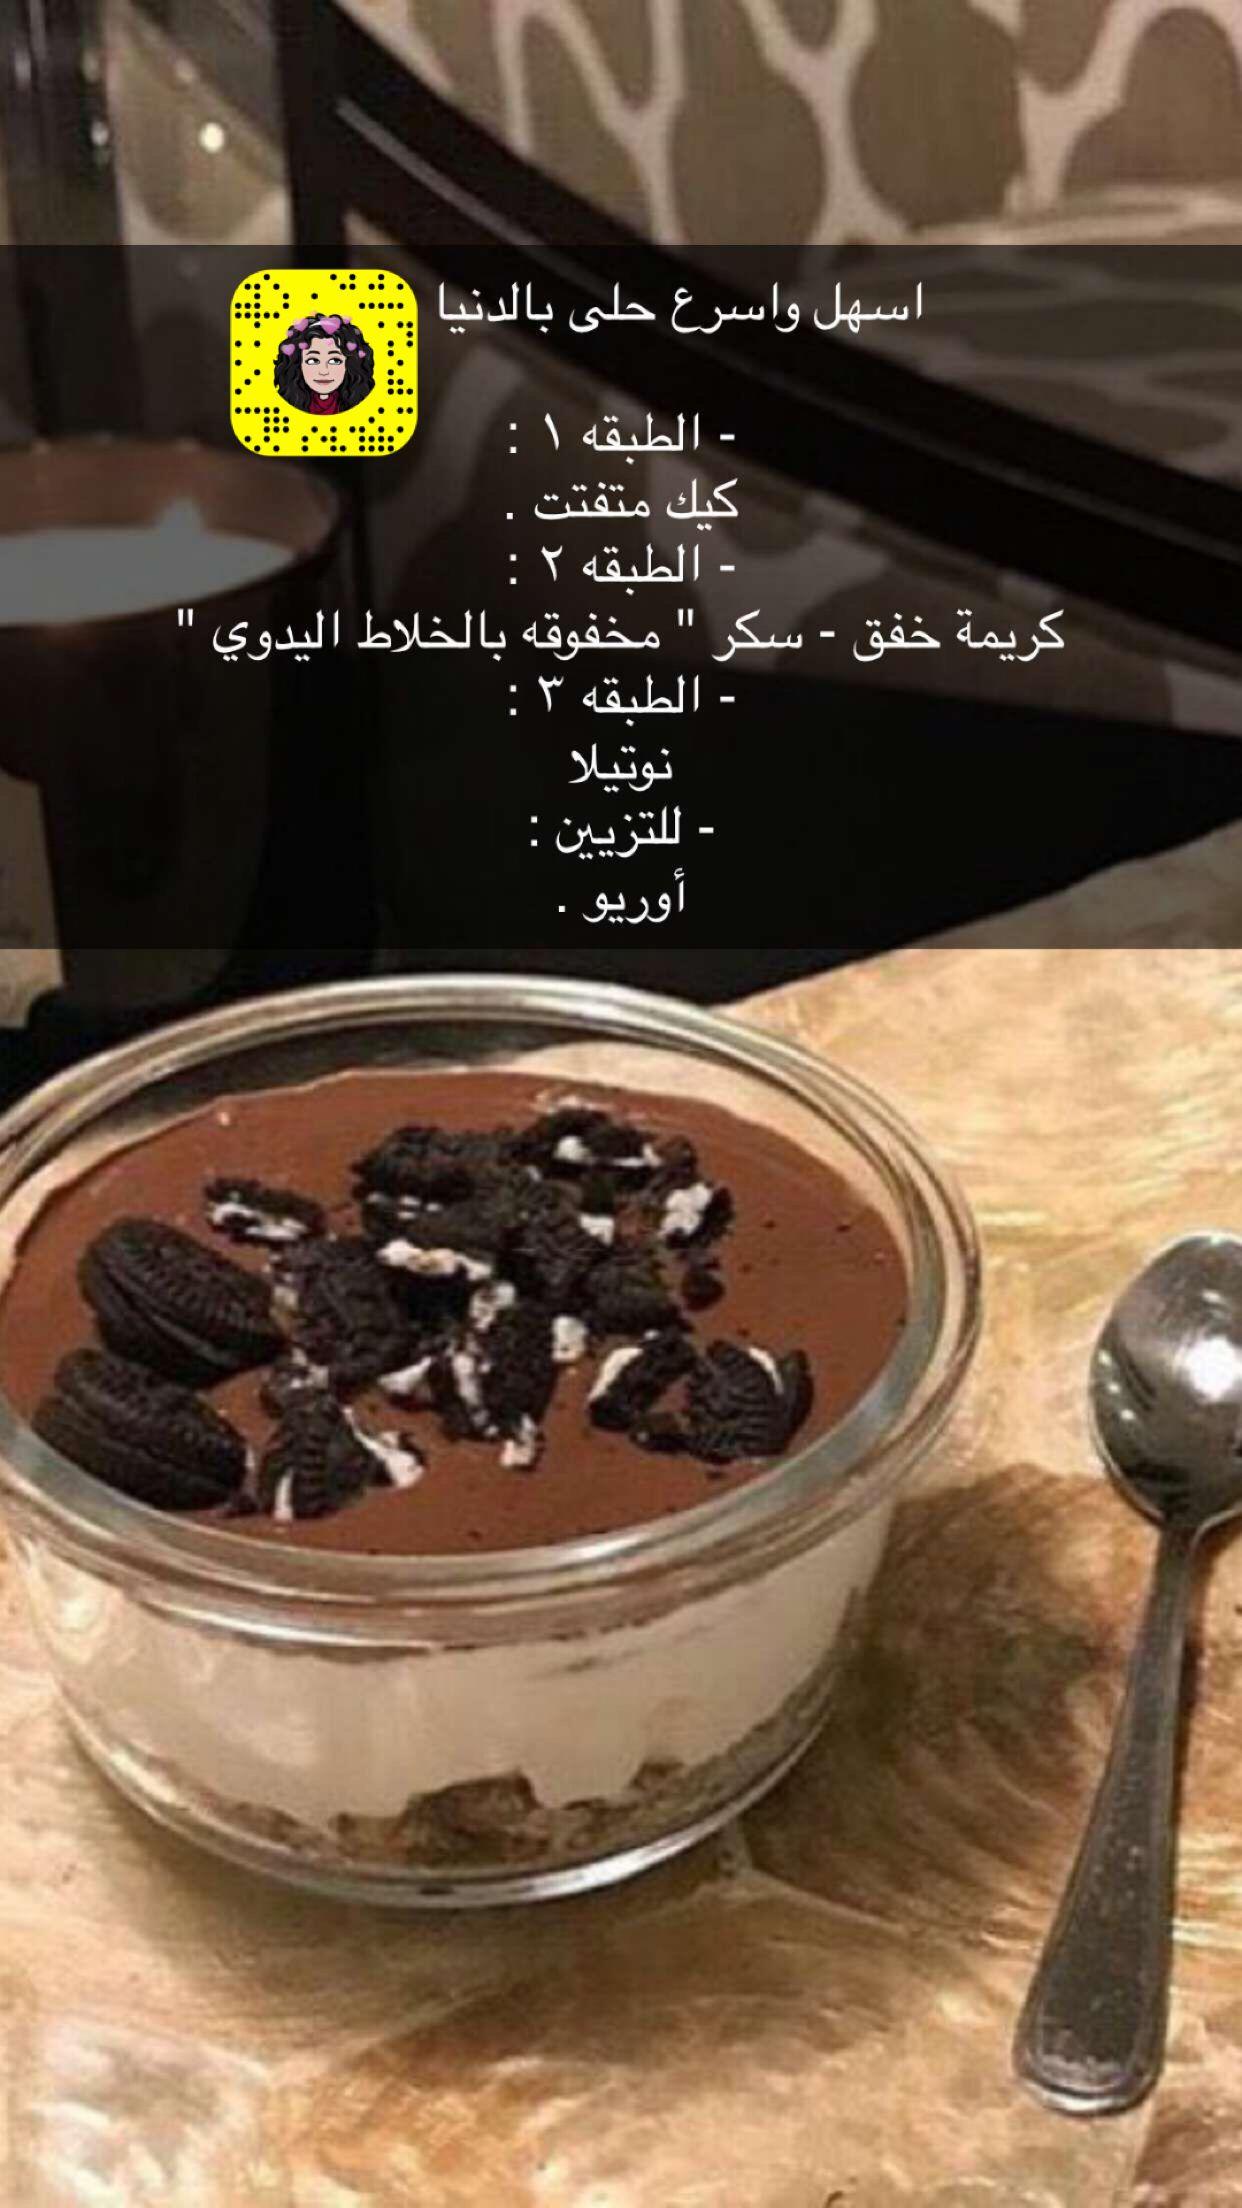 Pin By Beshoalhinaia On الطبخ Food Videos Desserts Yummy Food Dessert Food Drinks Dessert